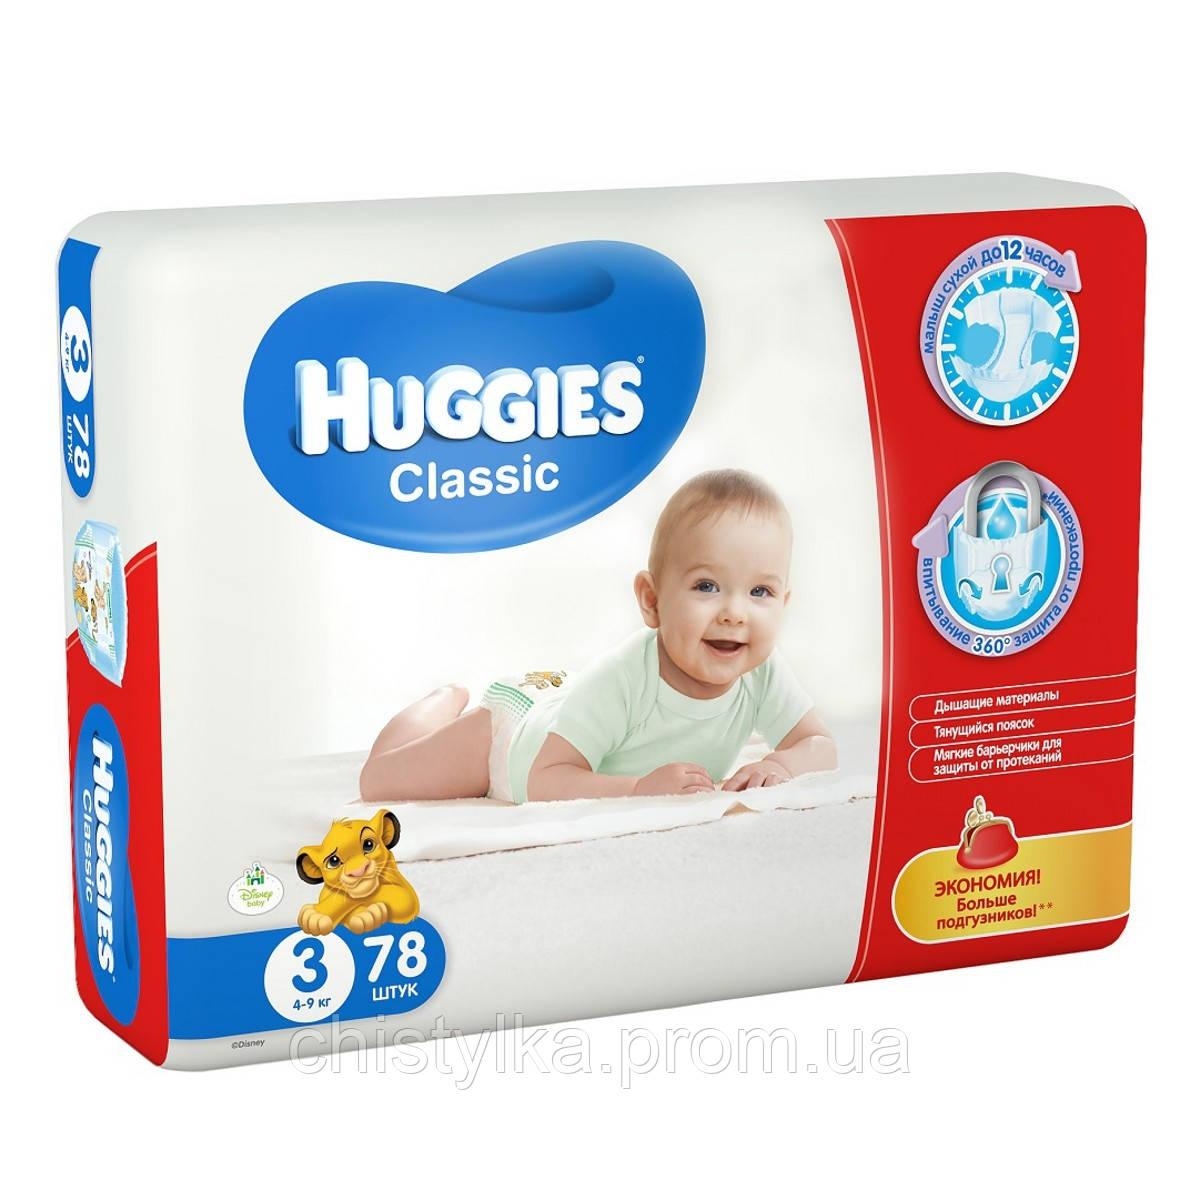 bea2091e9e0c Подгузники Huggies Classic 3 (4-9kg) 78шт, цена 275 грн., купить в ...